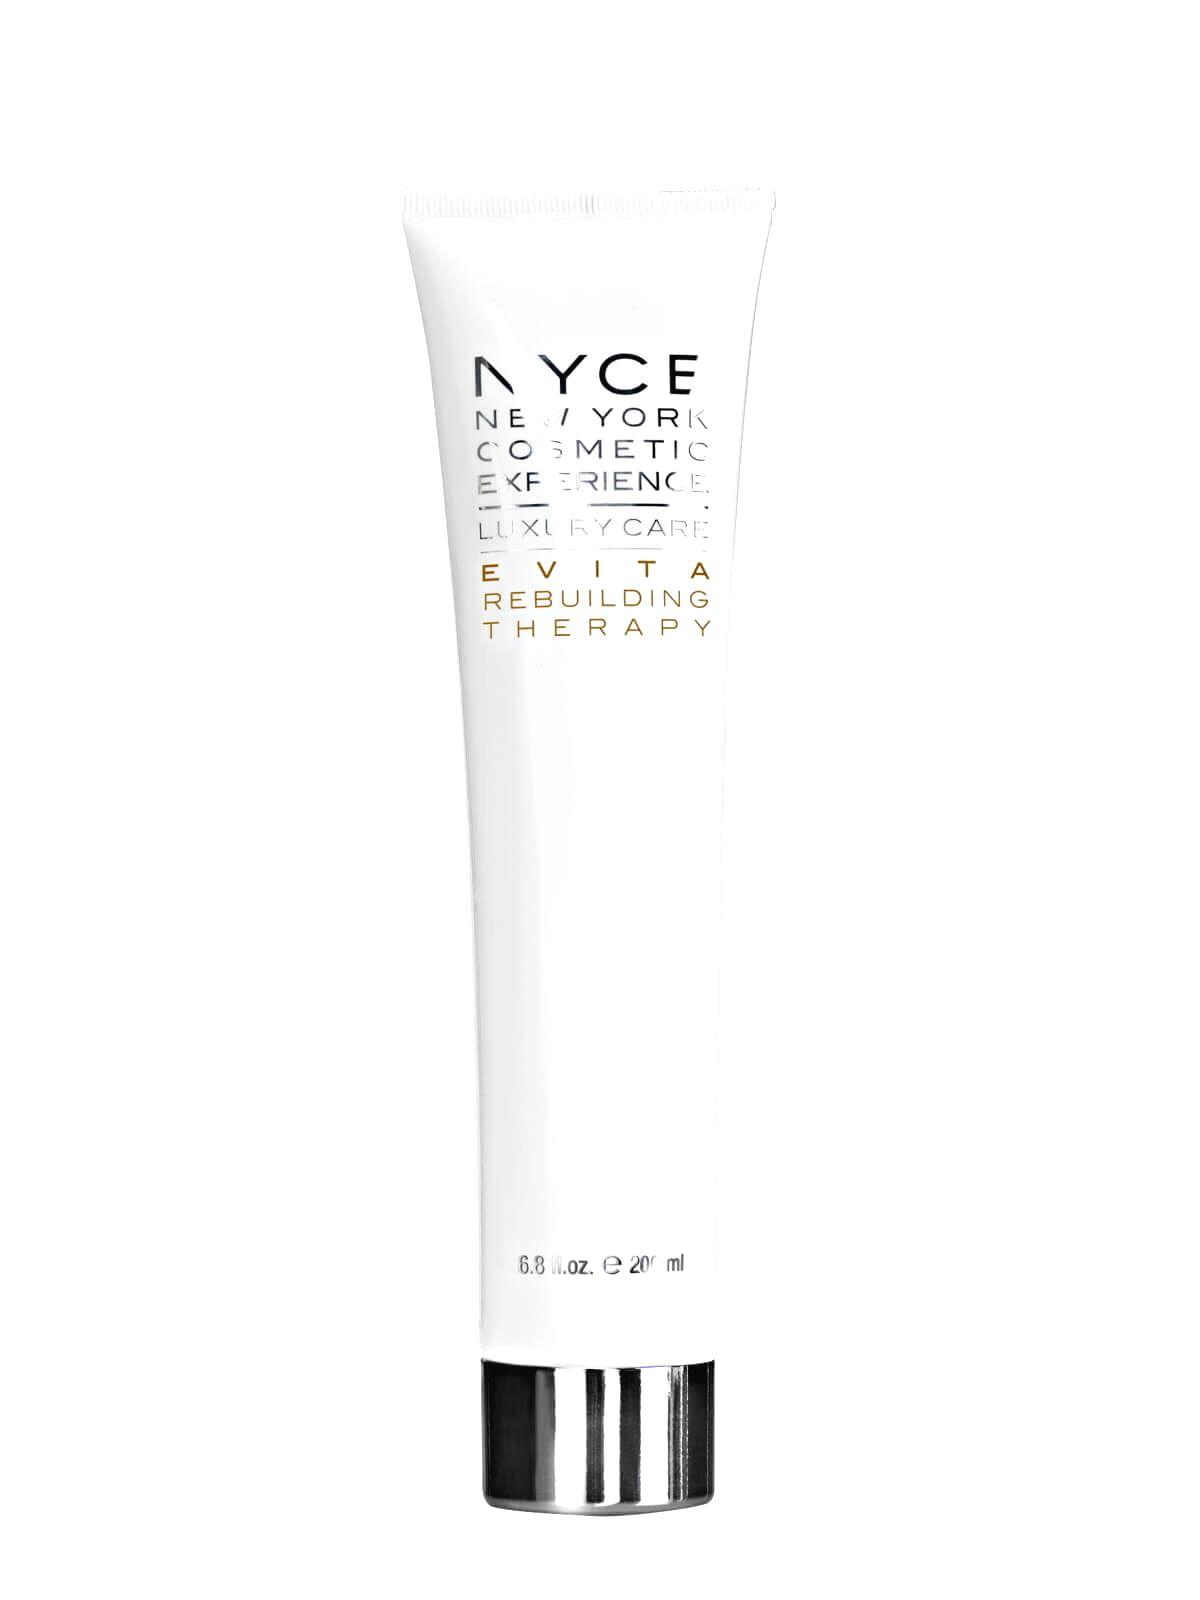 NYCE Reštrukturačná maska na suché a poškodené vlasy Evita (Rebuilding Therapy)200 ml